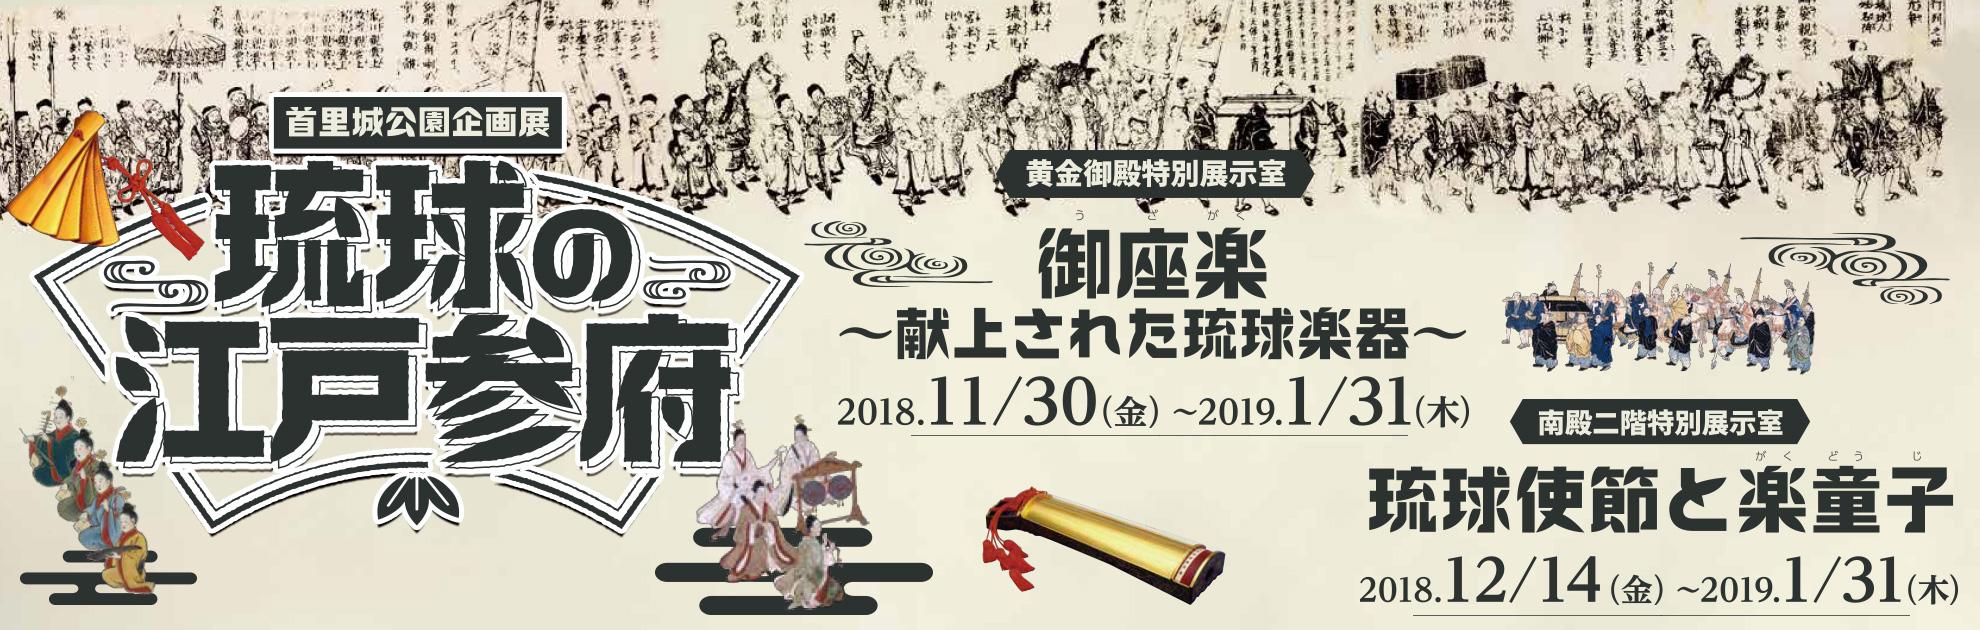 History event (reproduction ceremony) hyakujingobutsusan